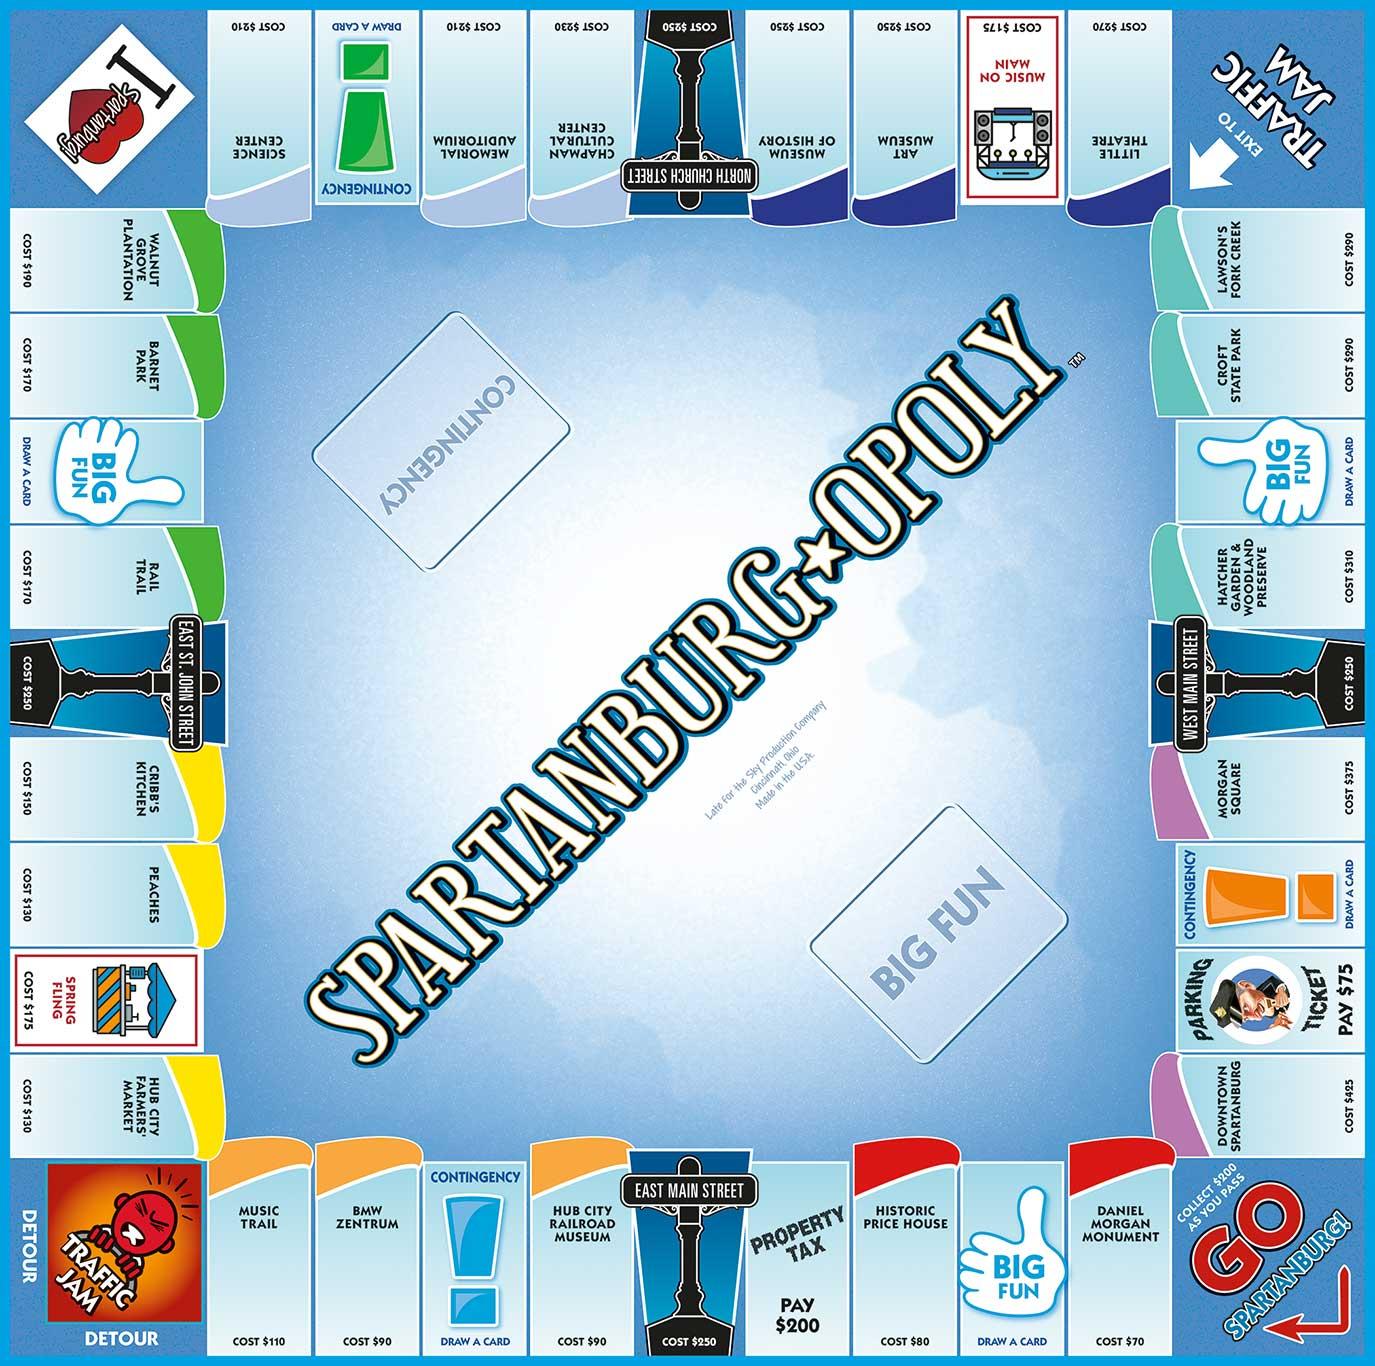 SPARTANBURG-OPOLY Board Game